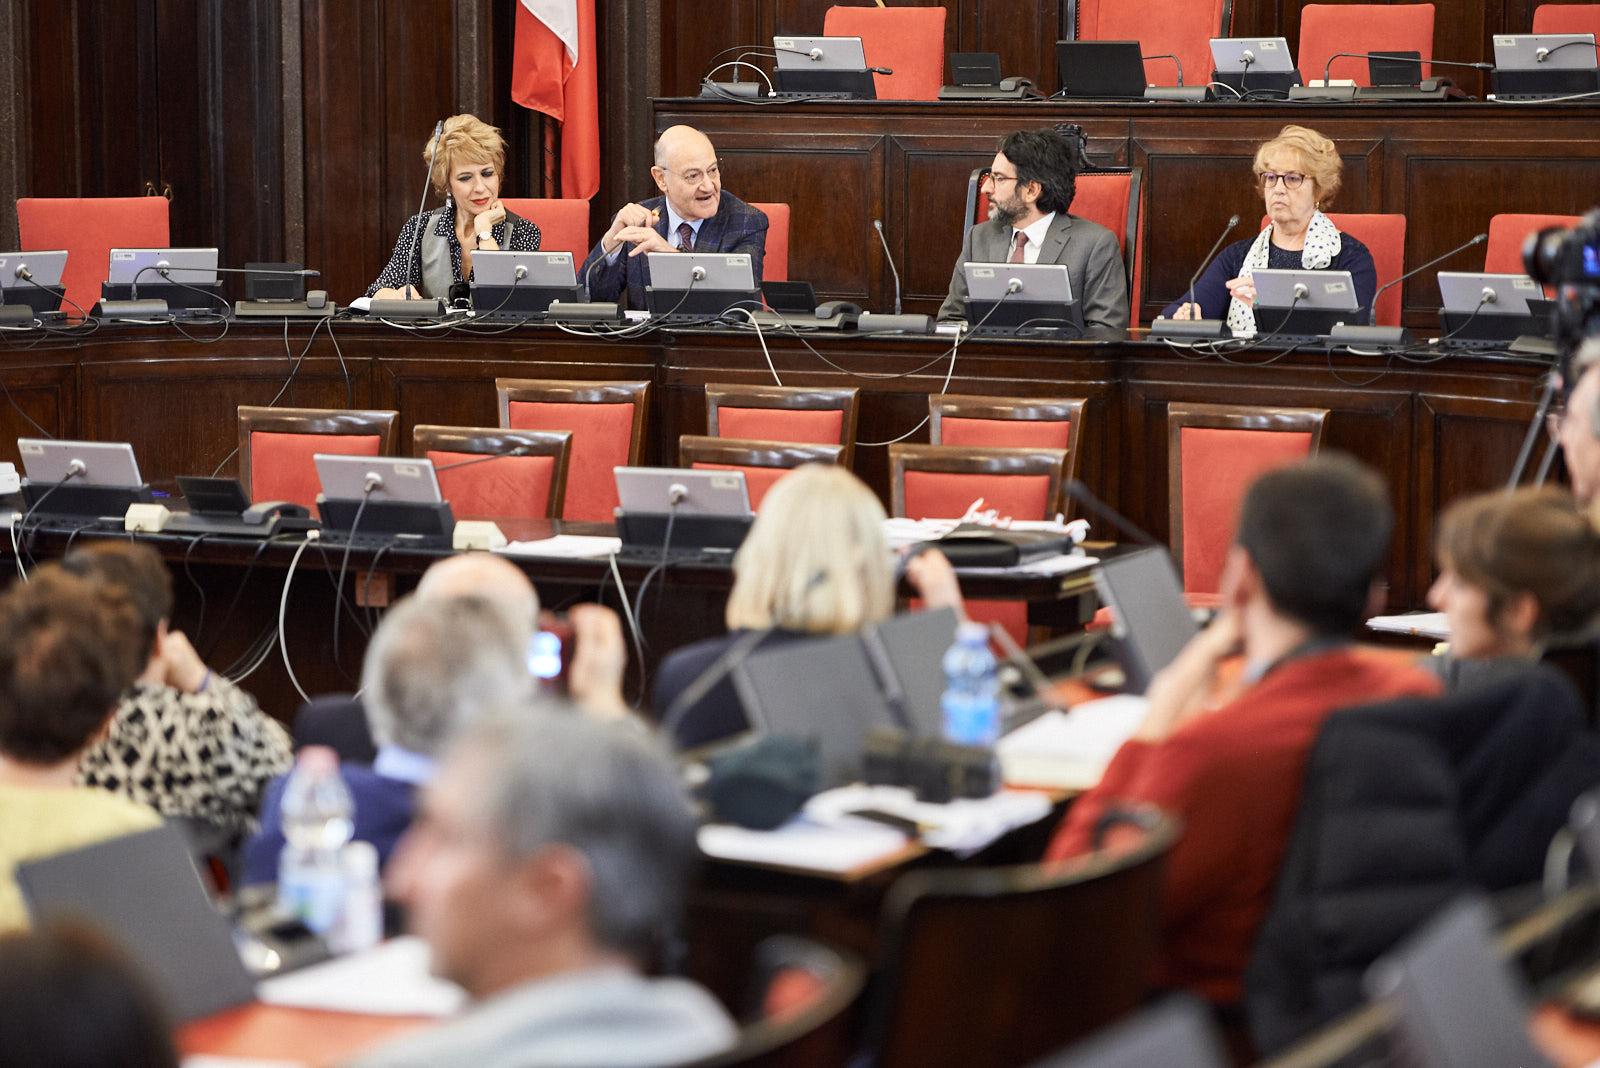 Gianna Coletti, Gabriele Nissim, Lamberto Bertolé e Ulianova Radice